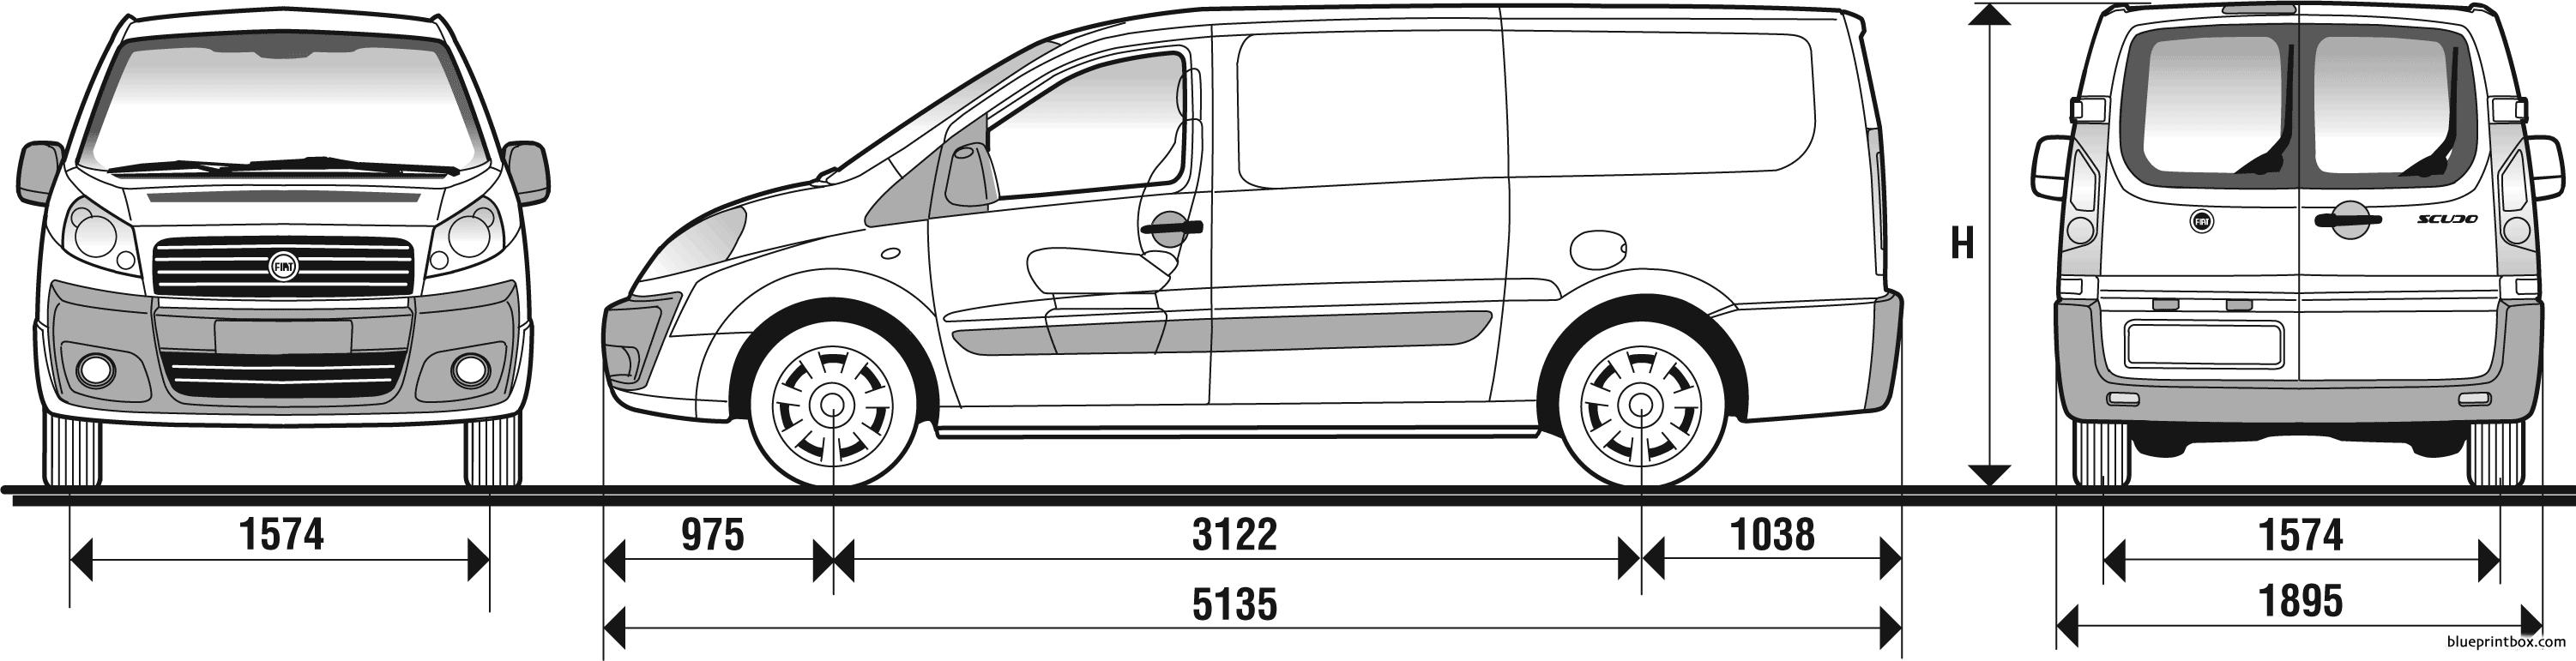 Fiat Scudo Panelled Lwb Van 2007 - Blueprintbox Com